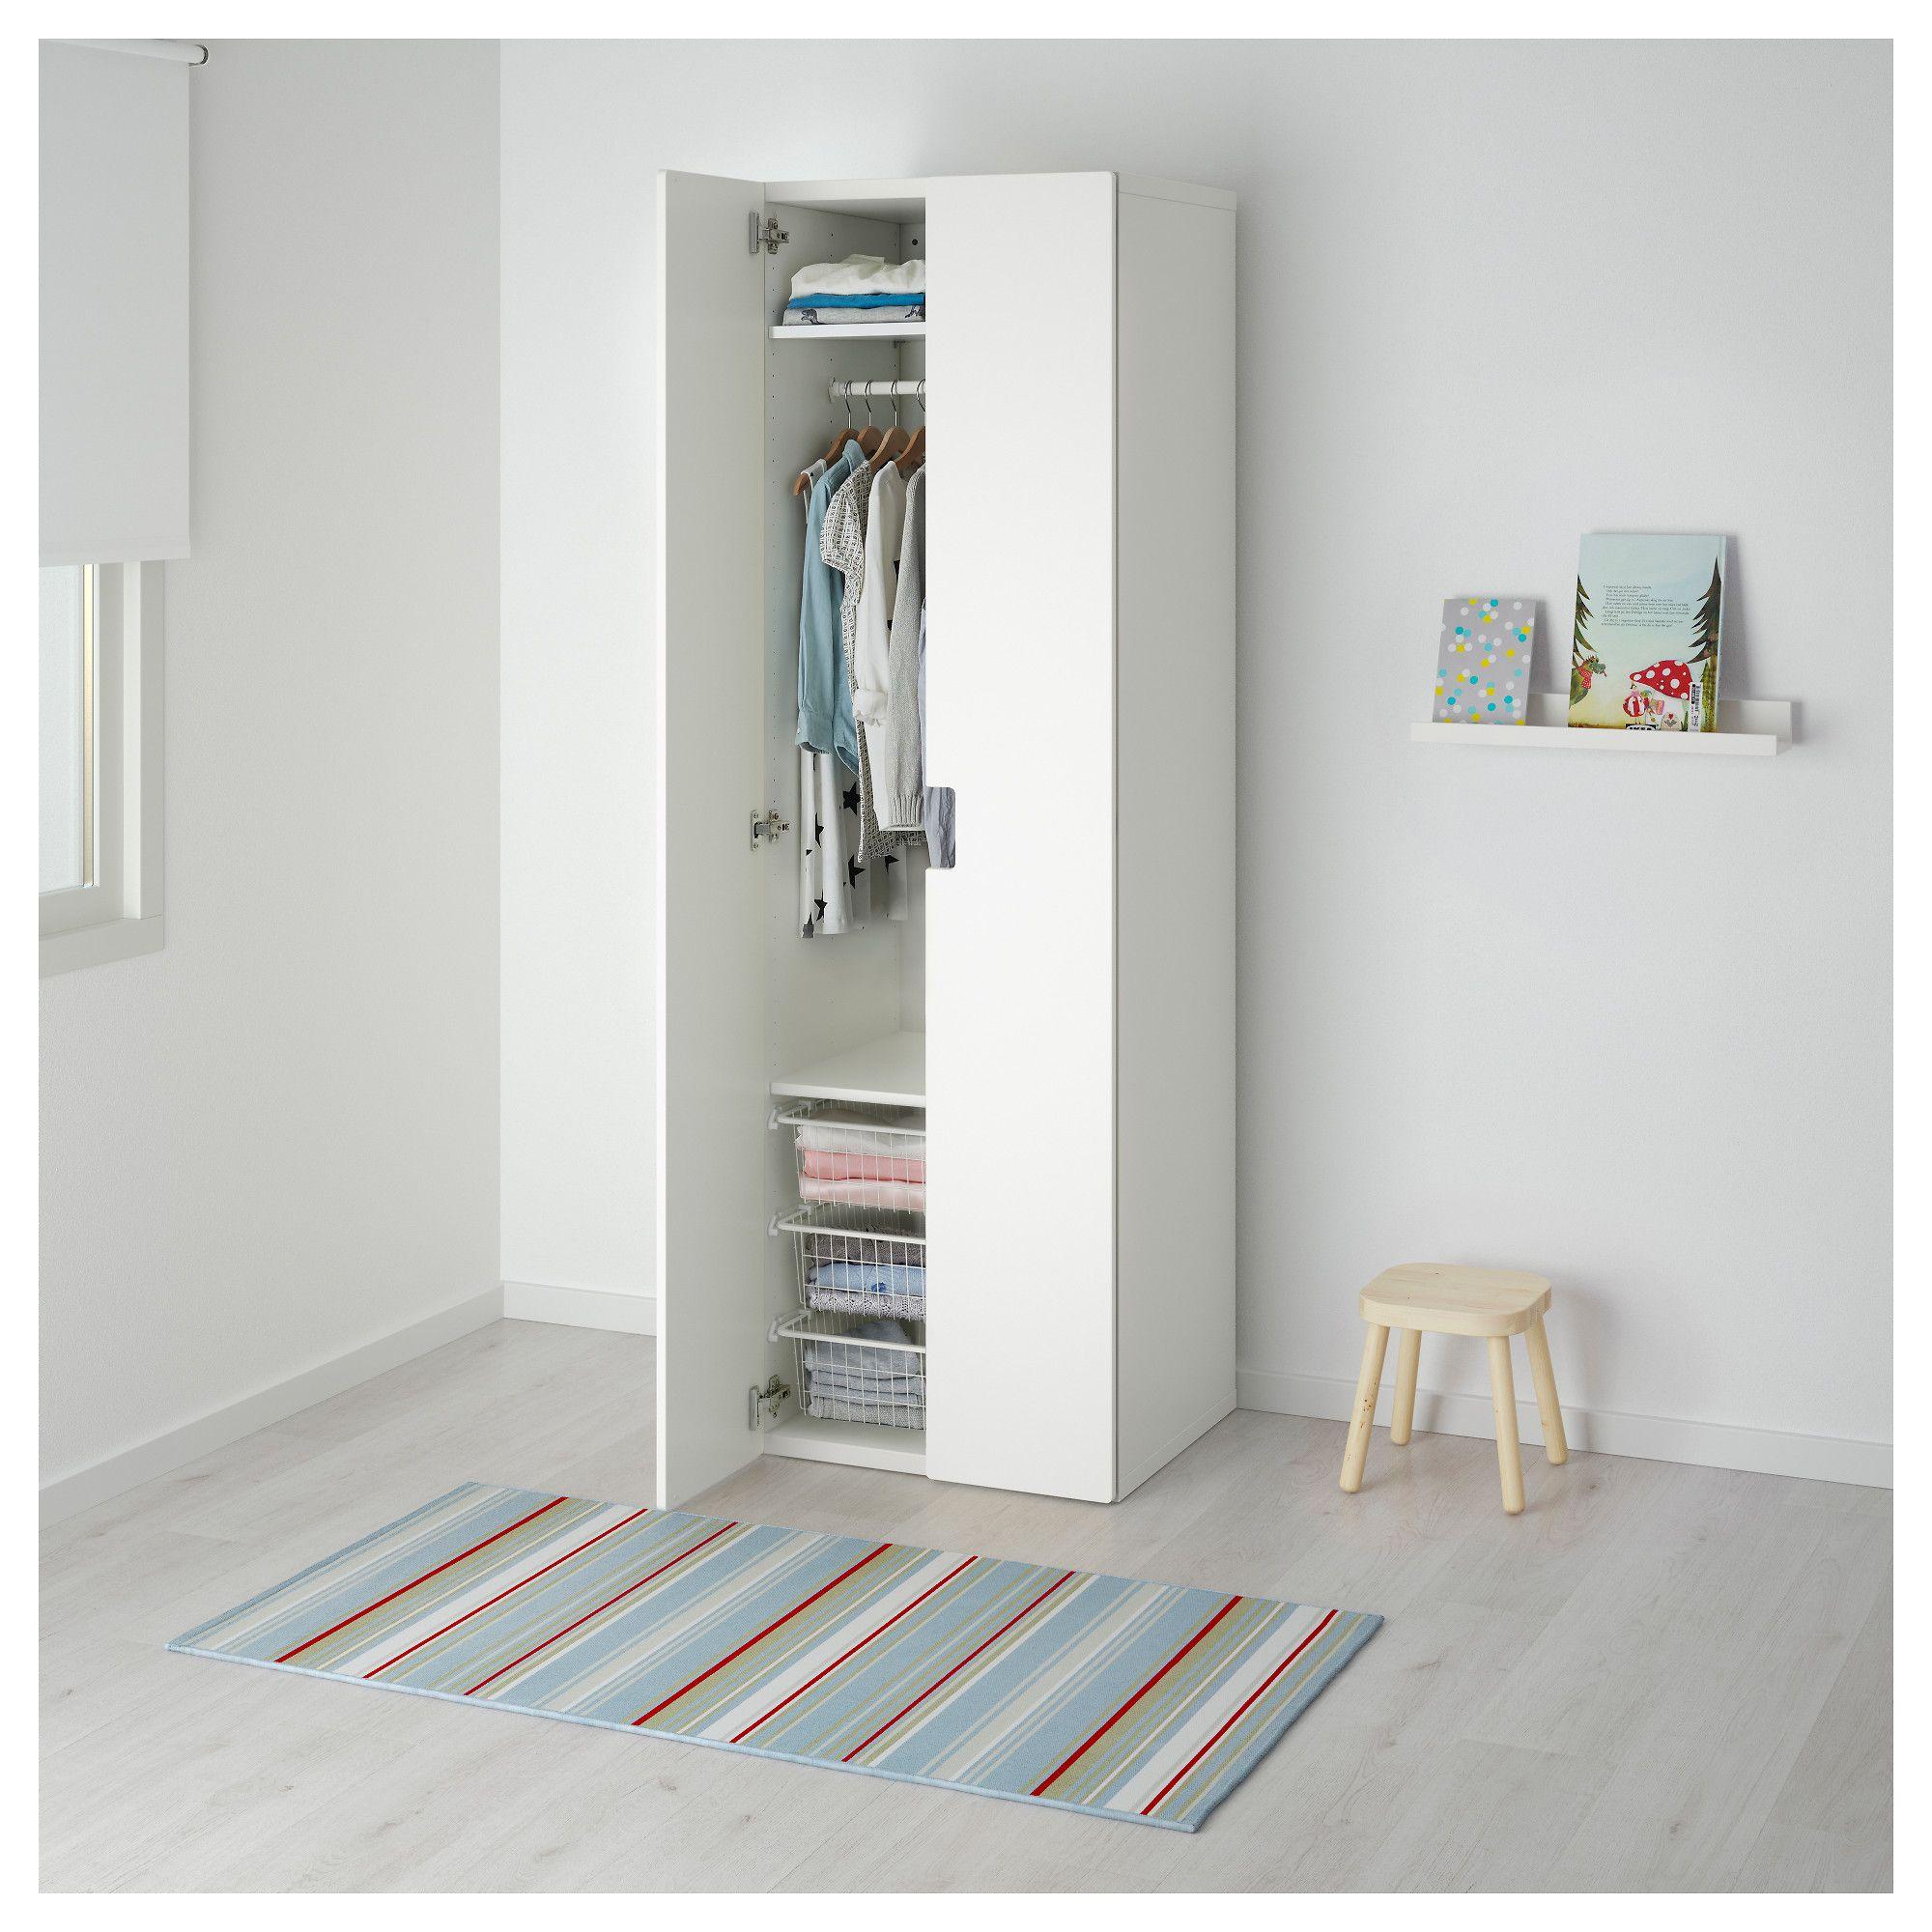 5446634761f93cd2006f319656f74279 Luxe De Table Basse Convertible Ikea Des Idées